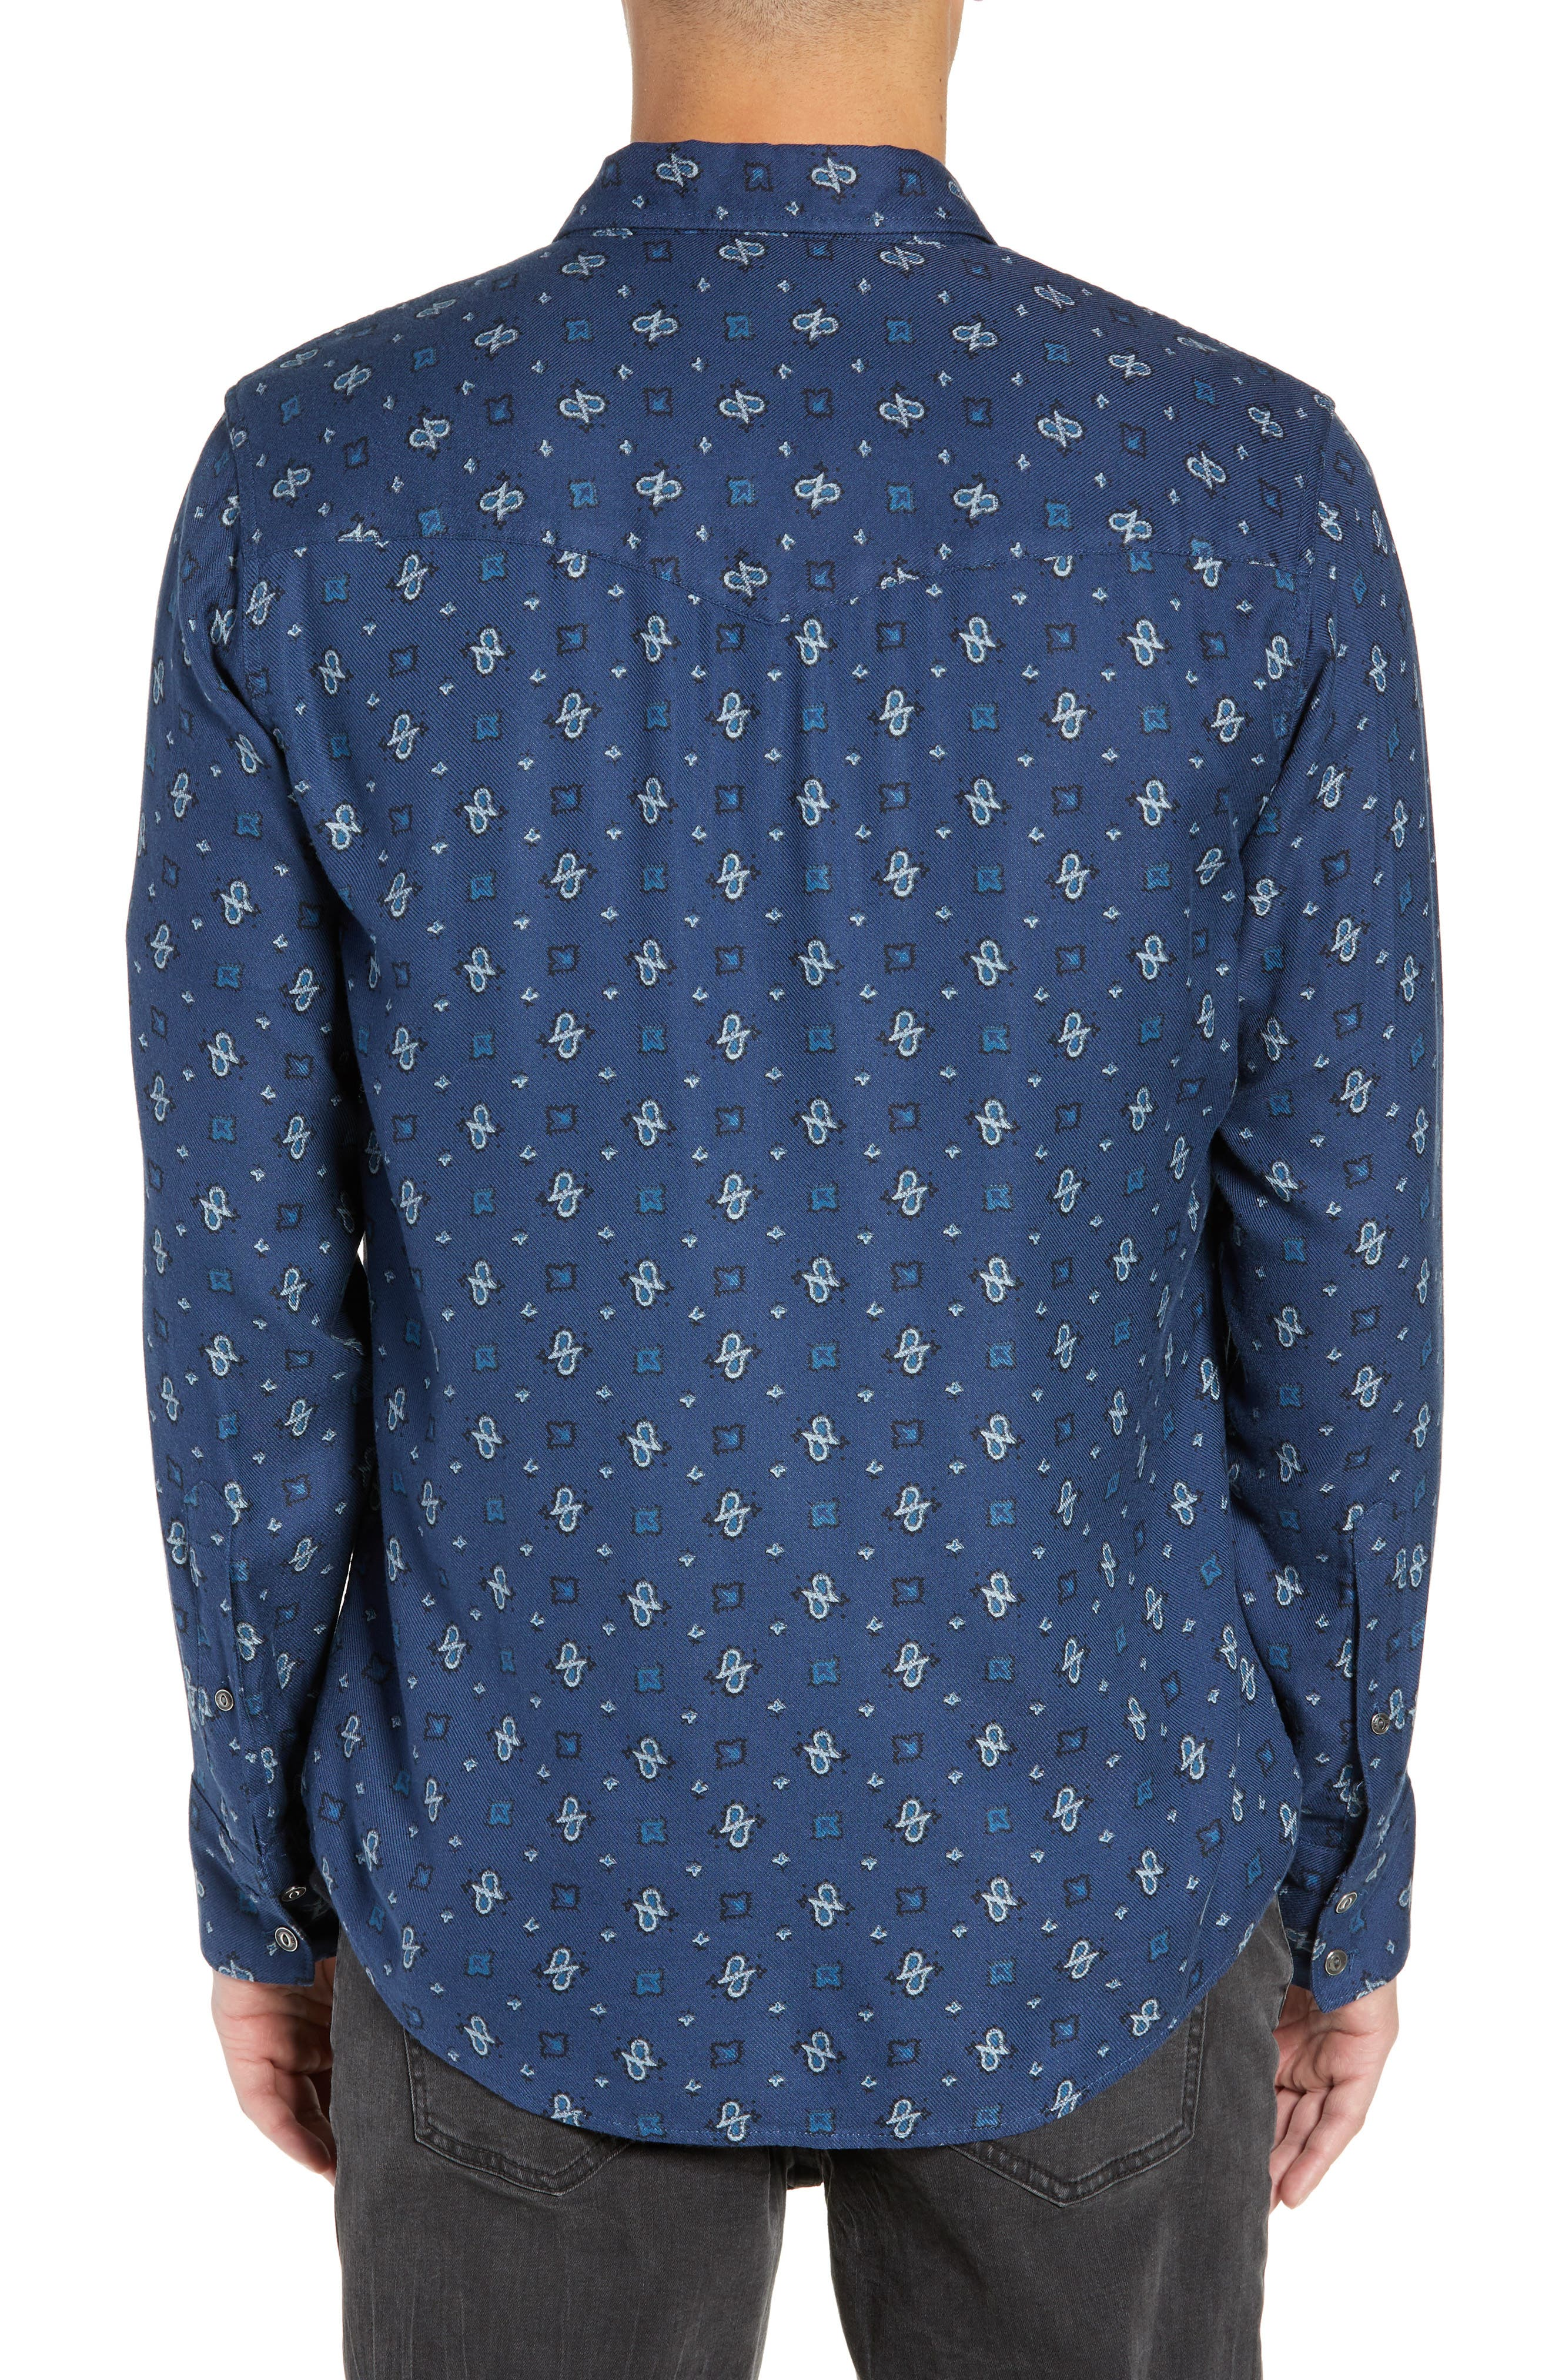 Regular Fit Paisley Western Shirt,                             Alternate thumbnail 3, color,                             BLUE CASPIA DESERT PAISLEY